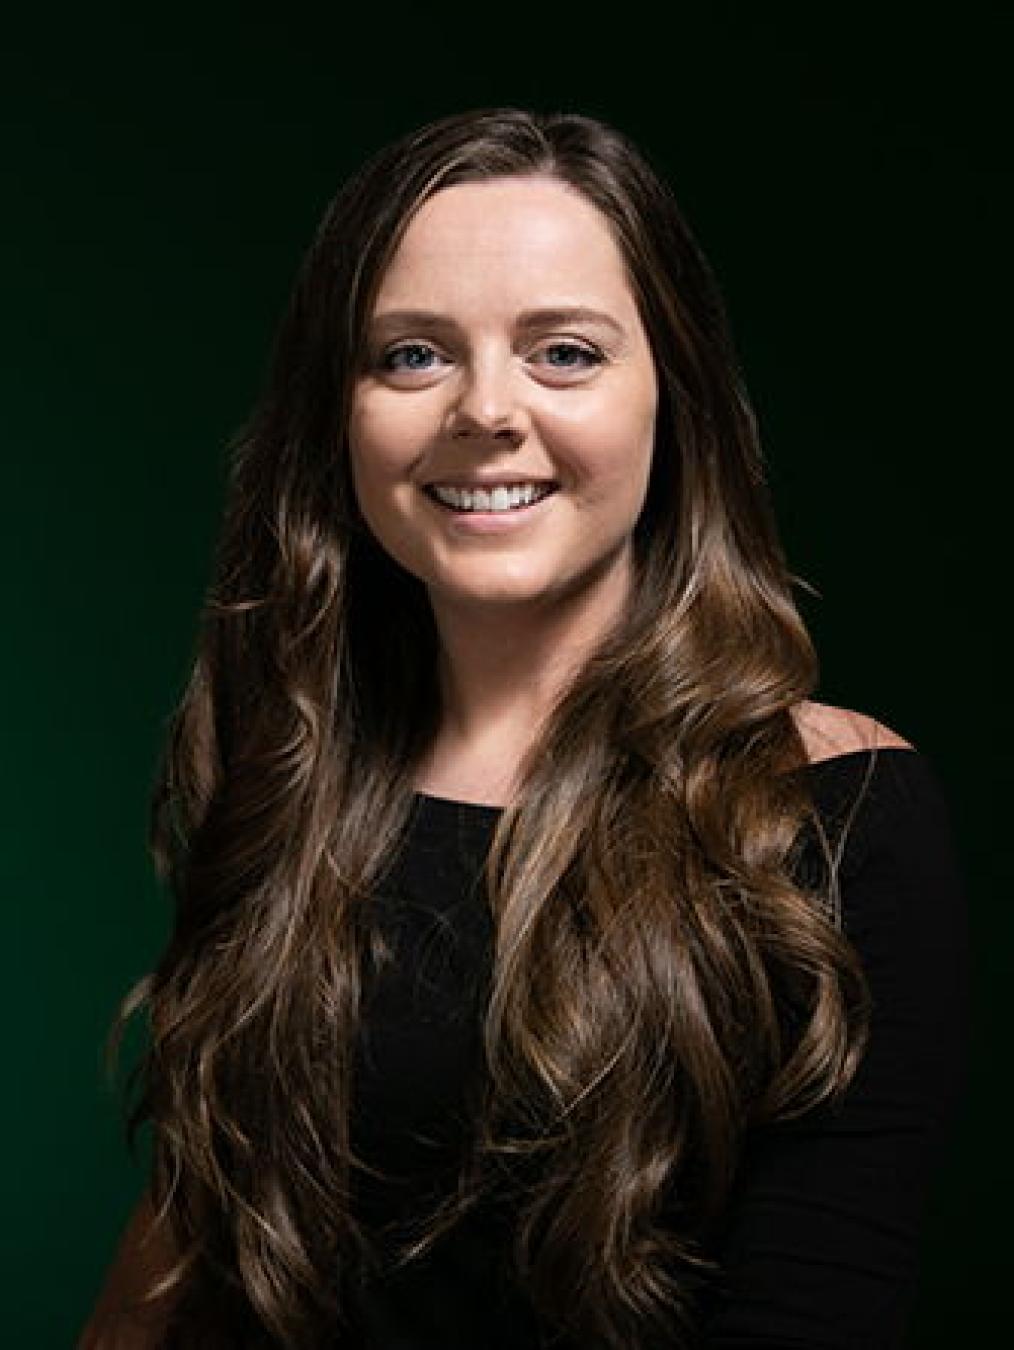 Kim Catchpole - Account Supervisor